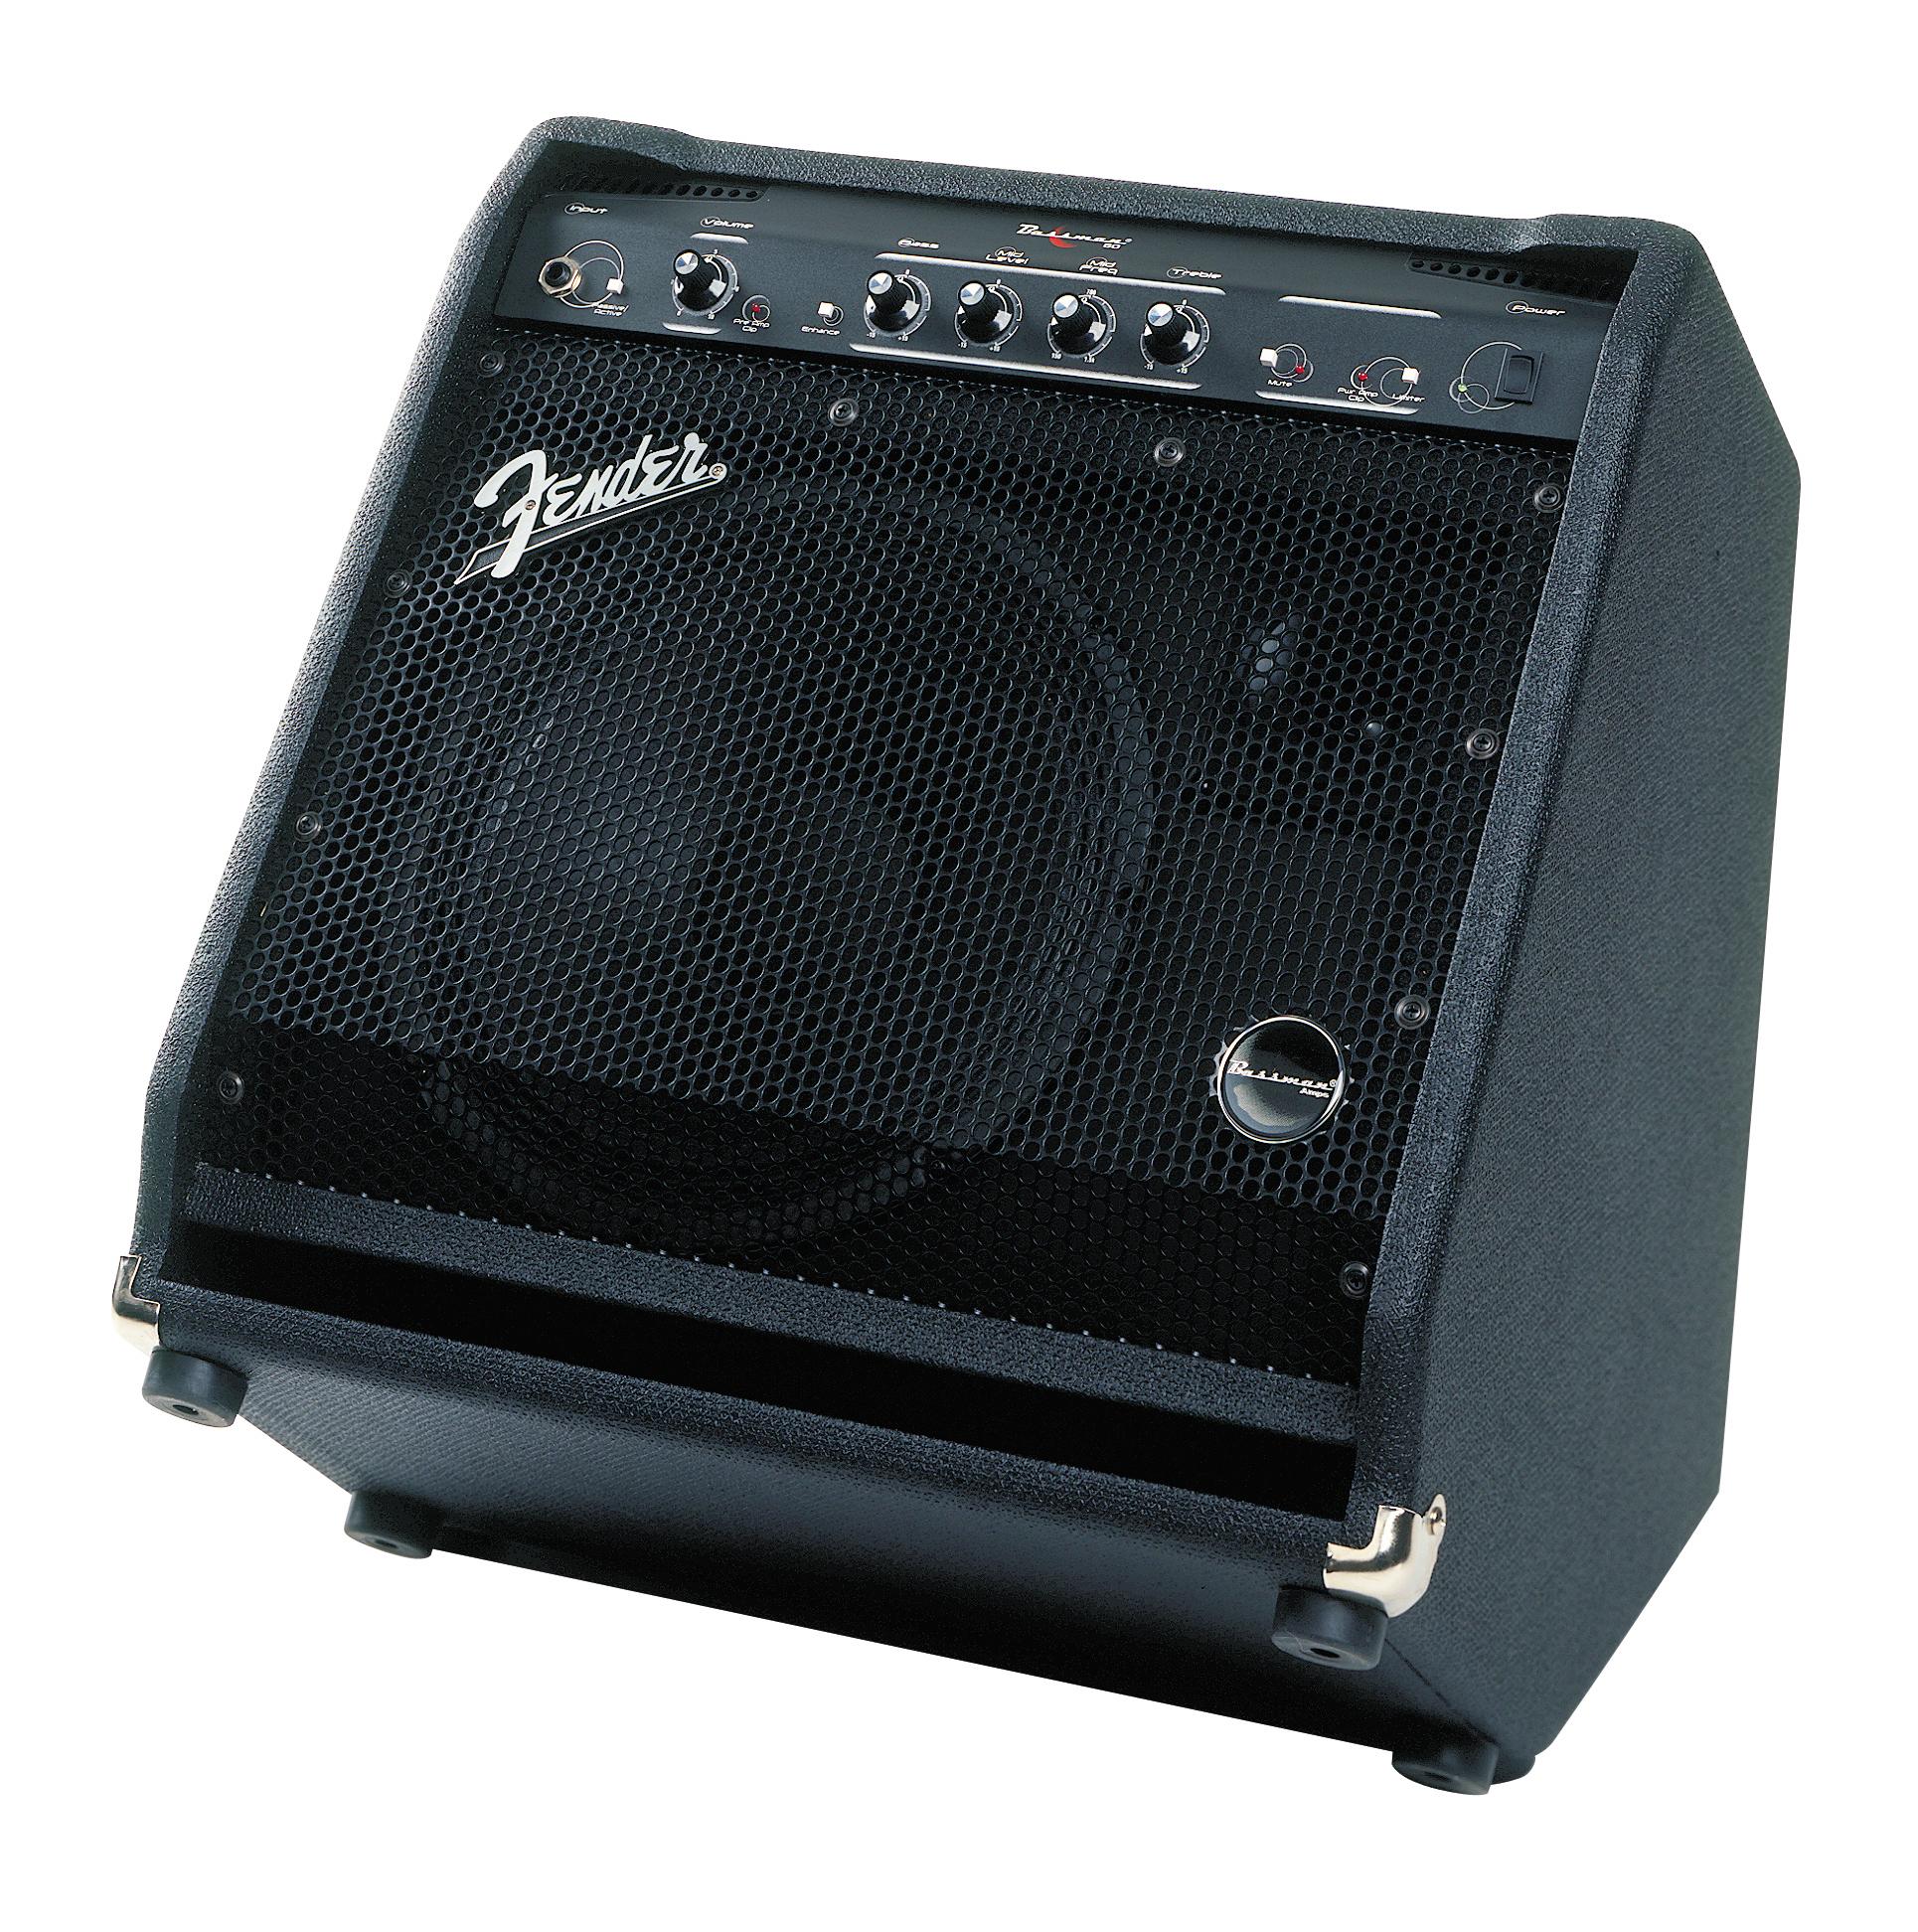 fender bassman 60 bass amplifier combo vinyl amp cover fend187. Black Bedroom Furniture Sets. Home Design Ideas